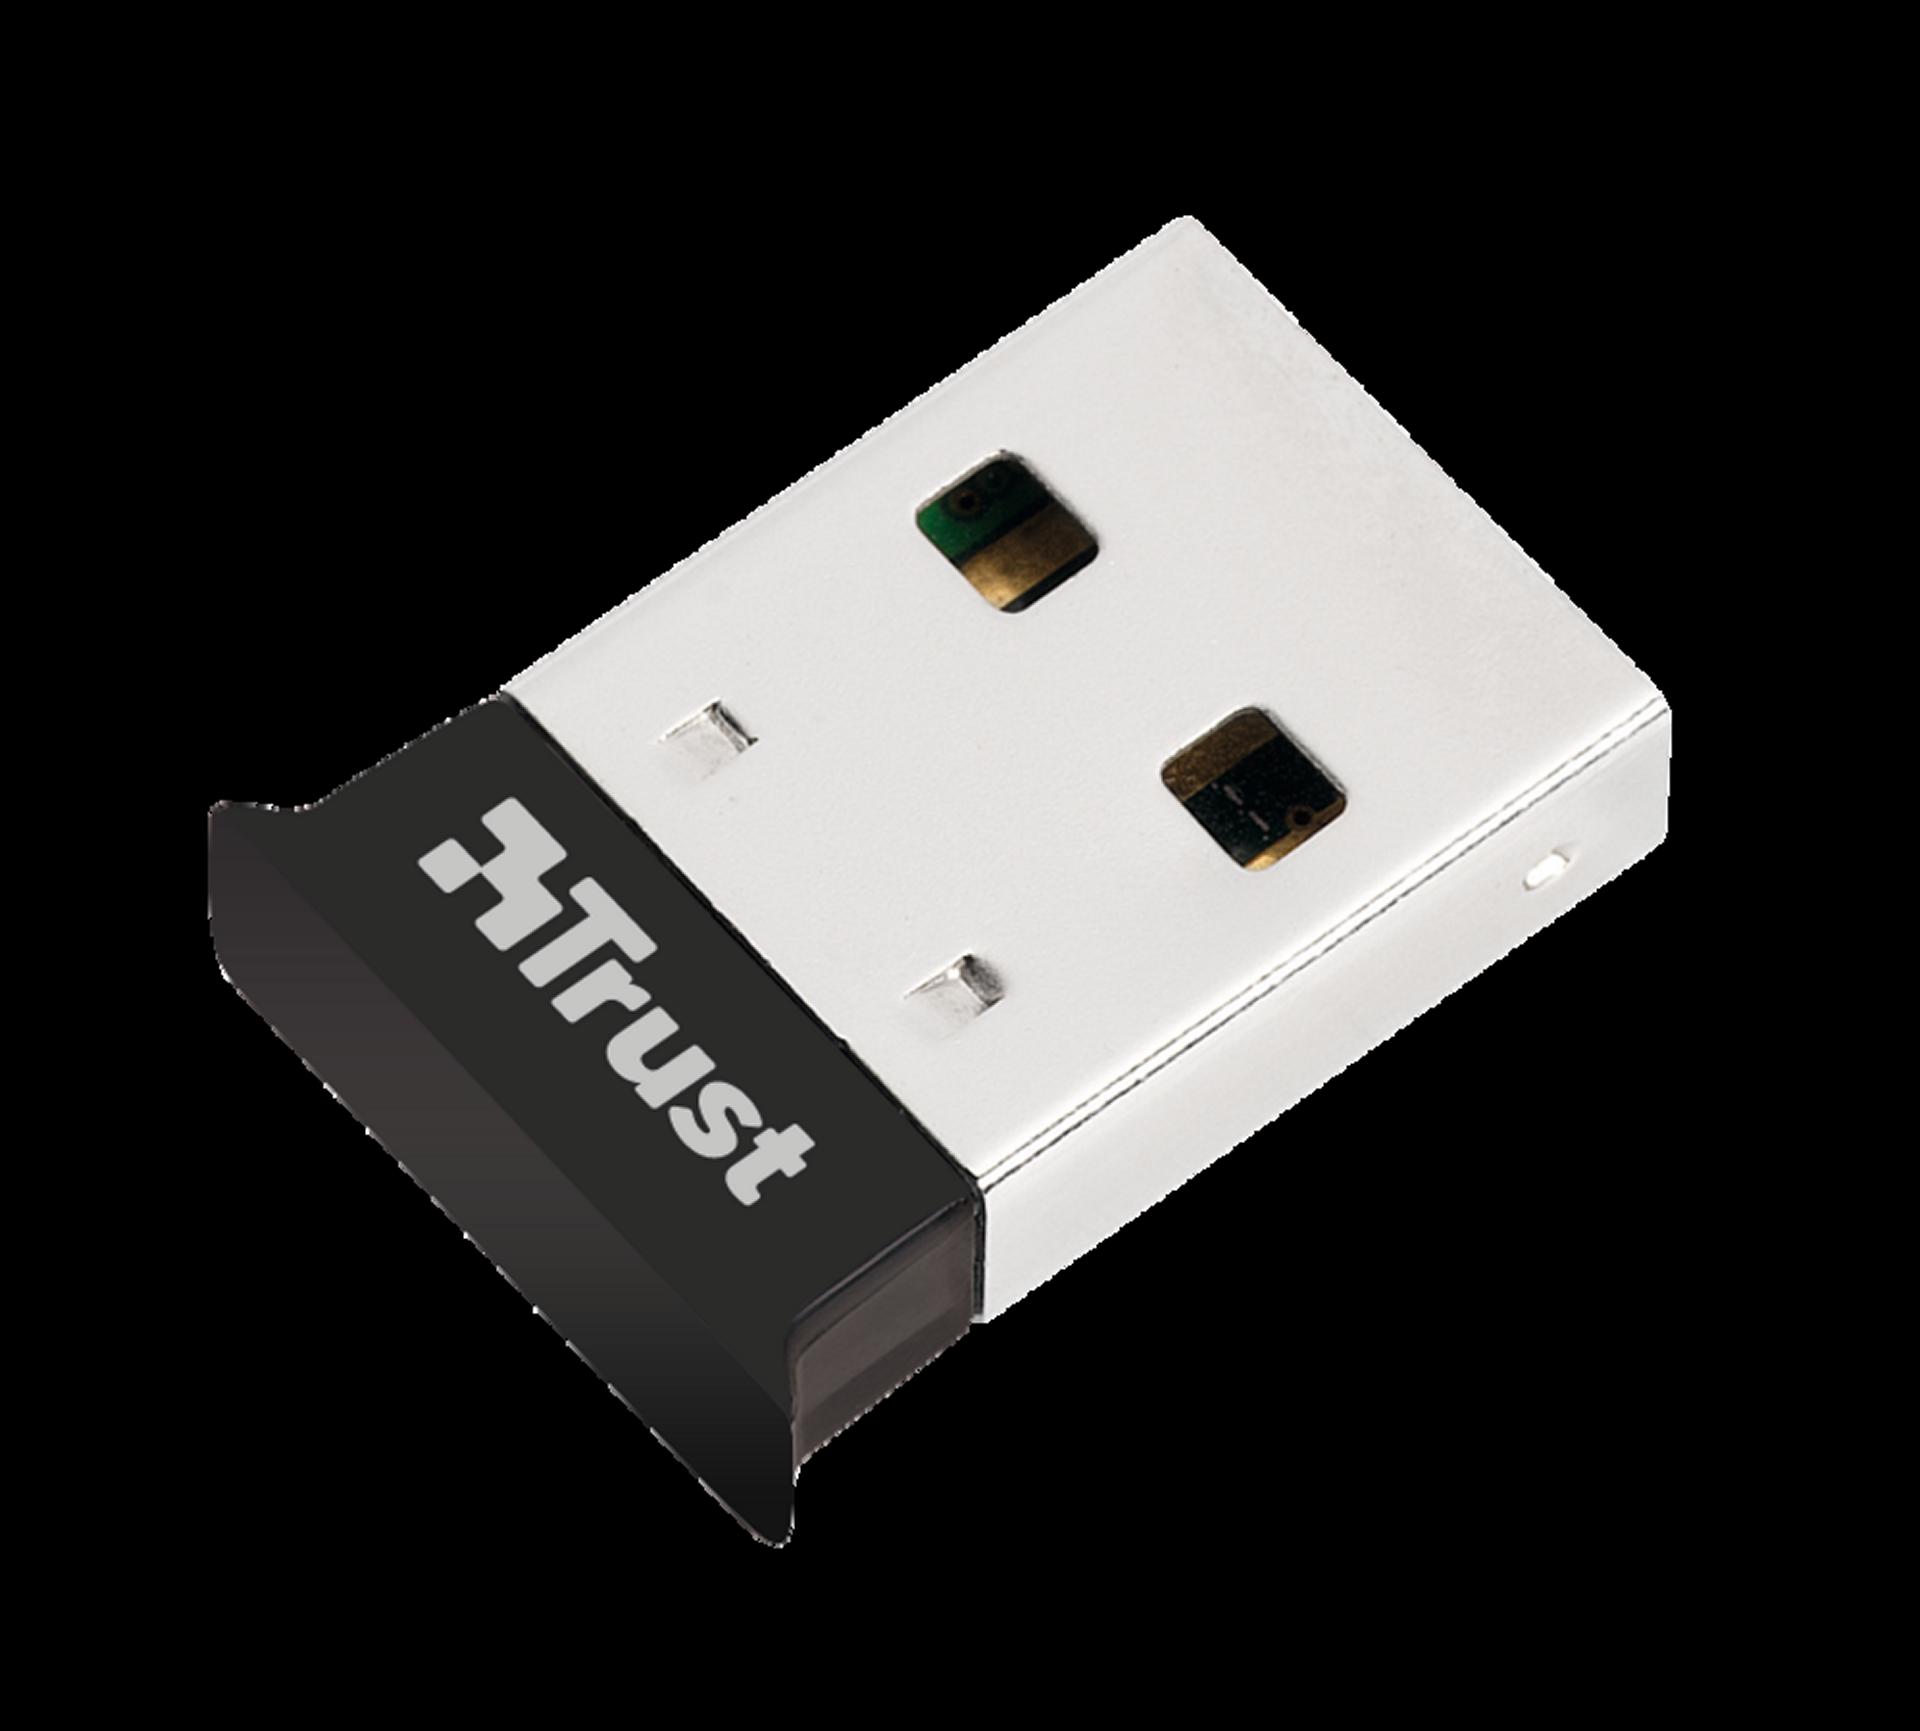 BT adapter TRUST Bluetooth 4.0. USB Adapter - 18187